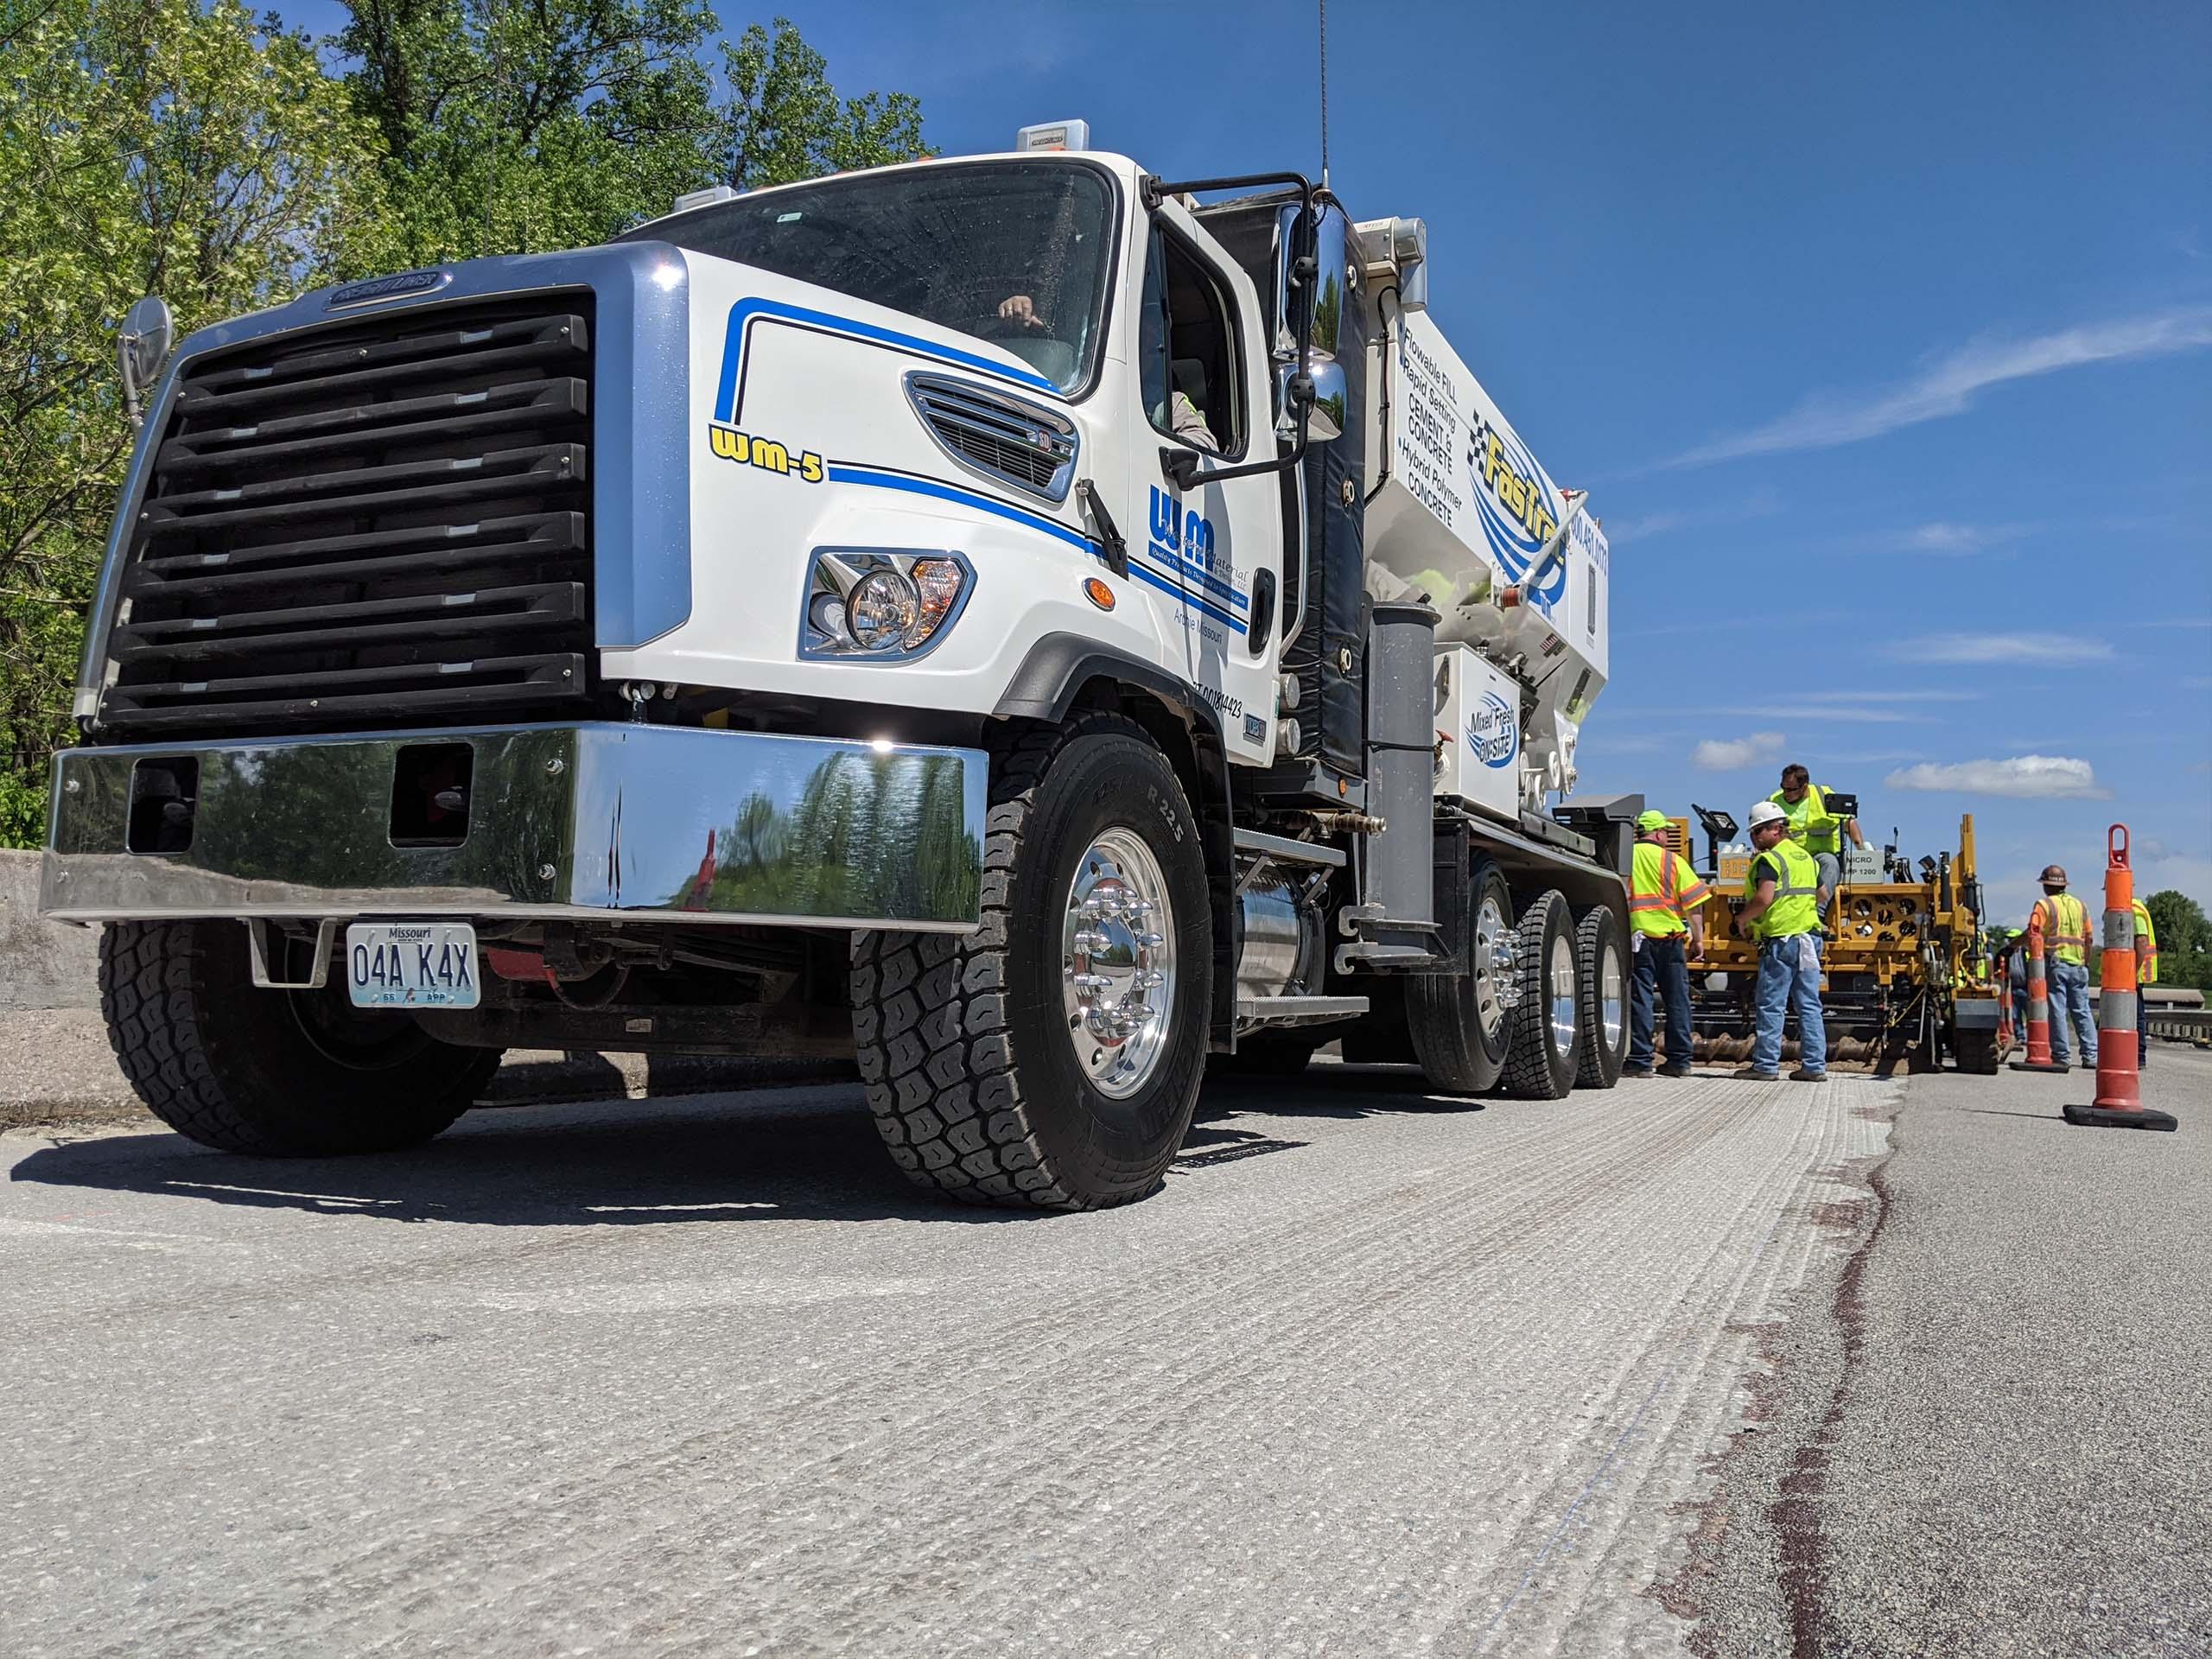 Franklin County, MO:  FasTrac Hybrid Polymer Concrete